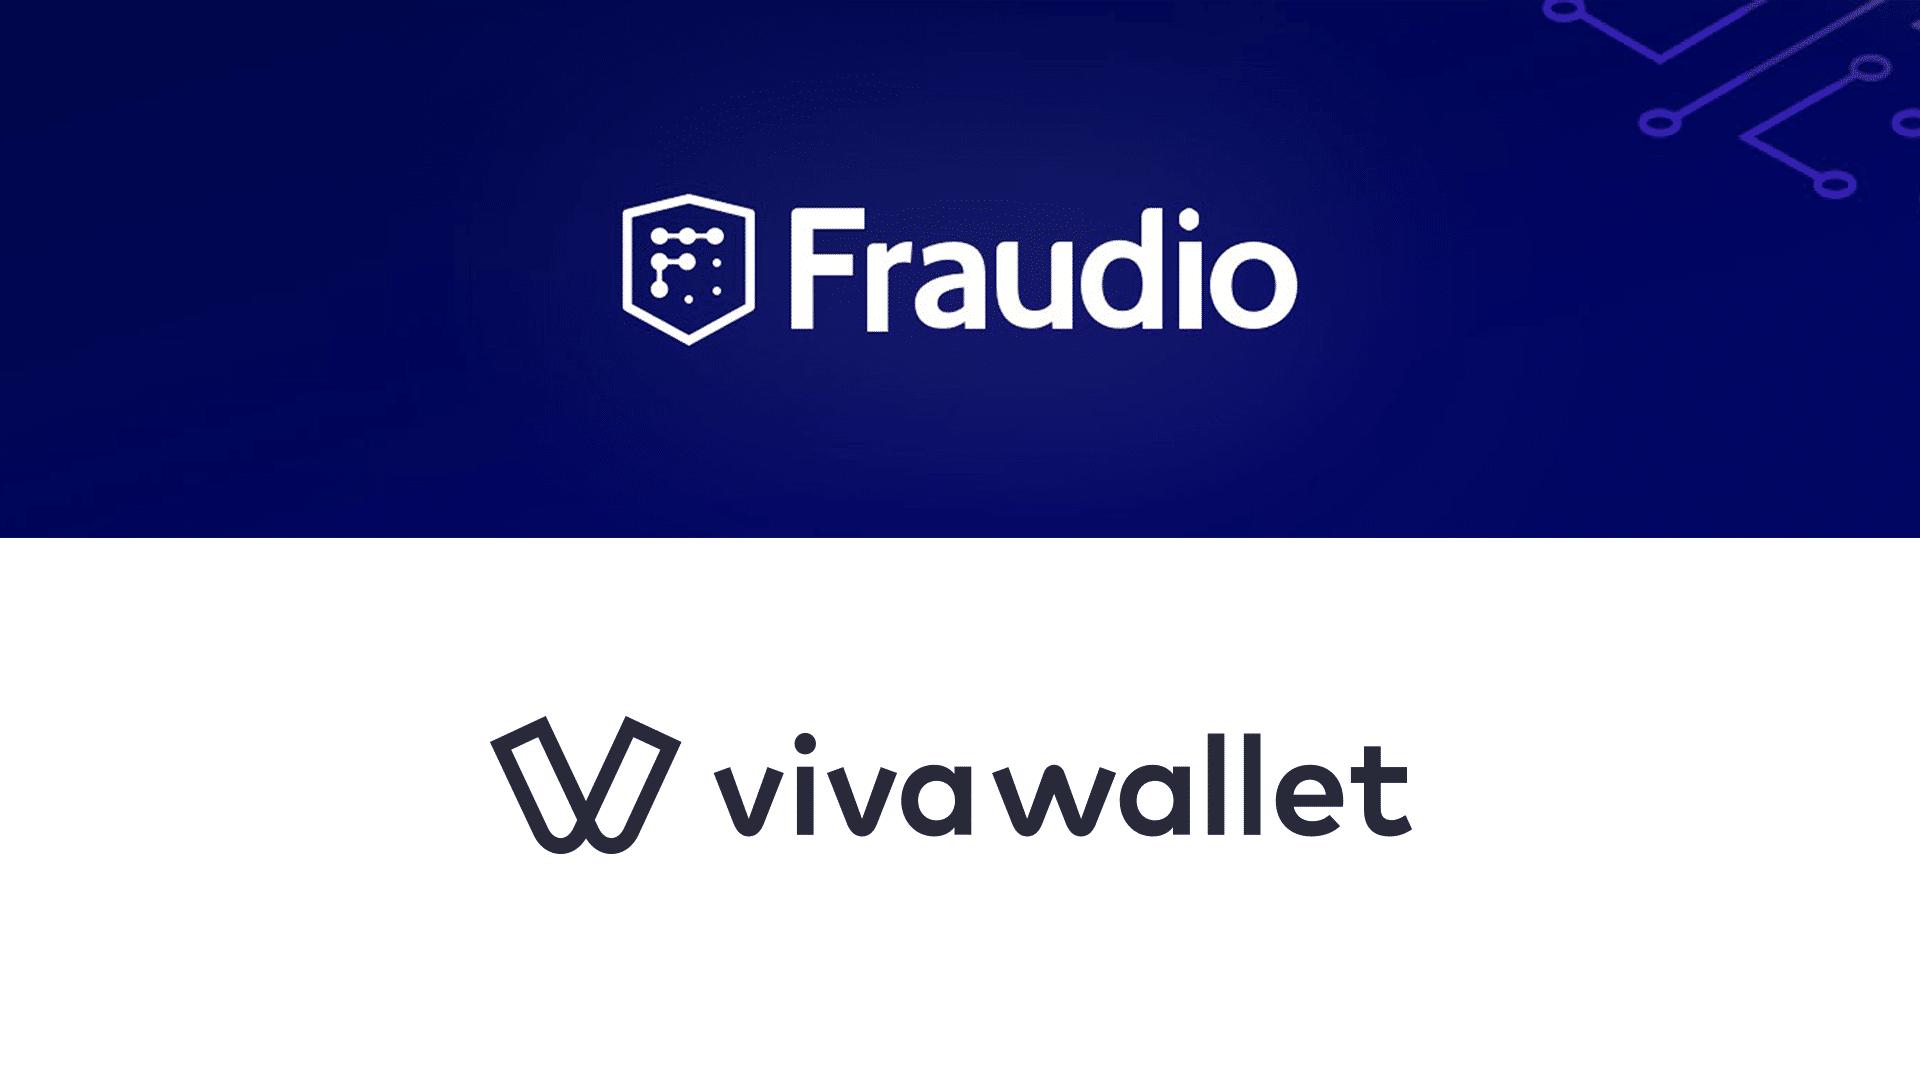 Viva Wallet e Fraudio: annunciata la partnership per combattere le frodi thumbnail